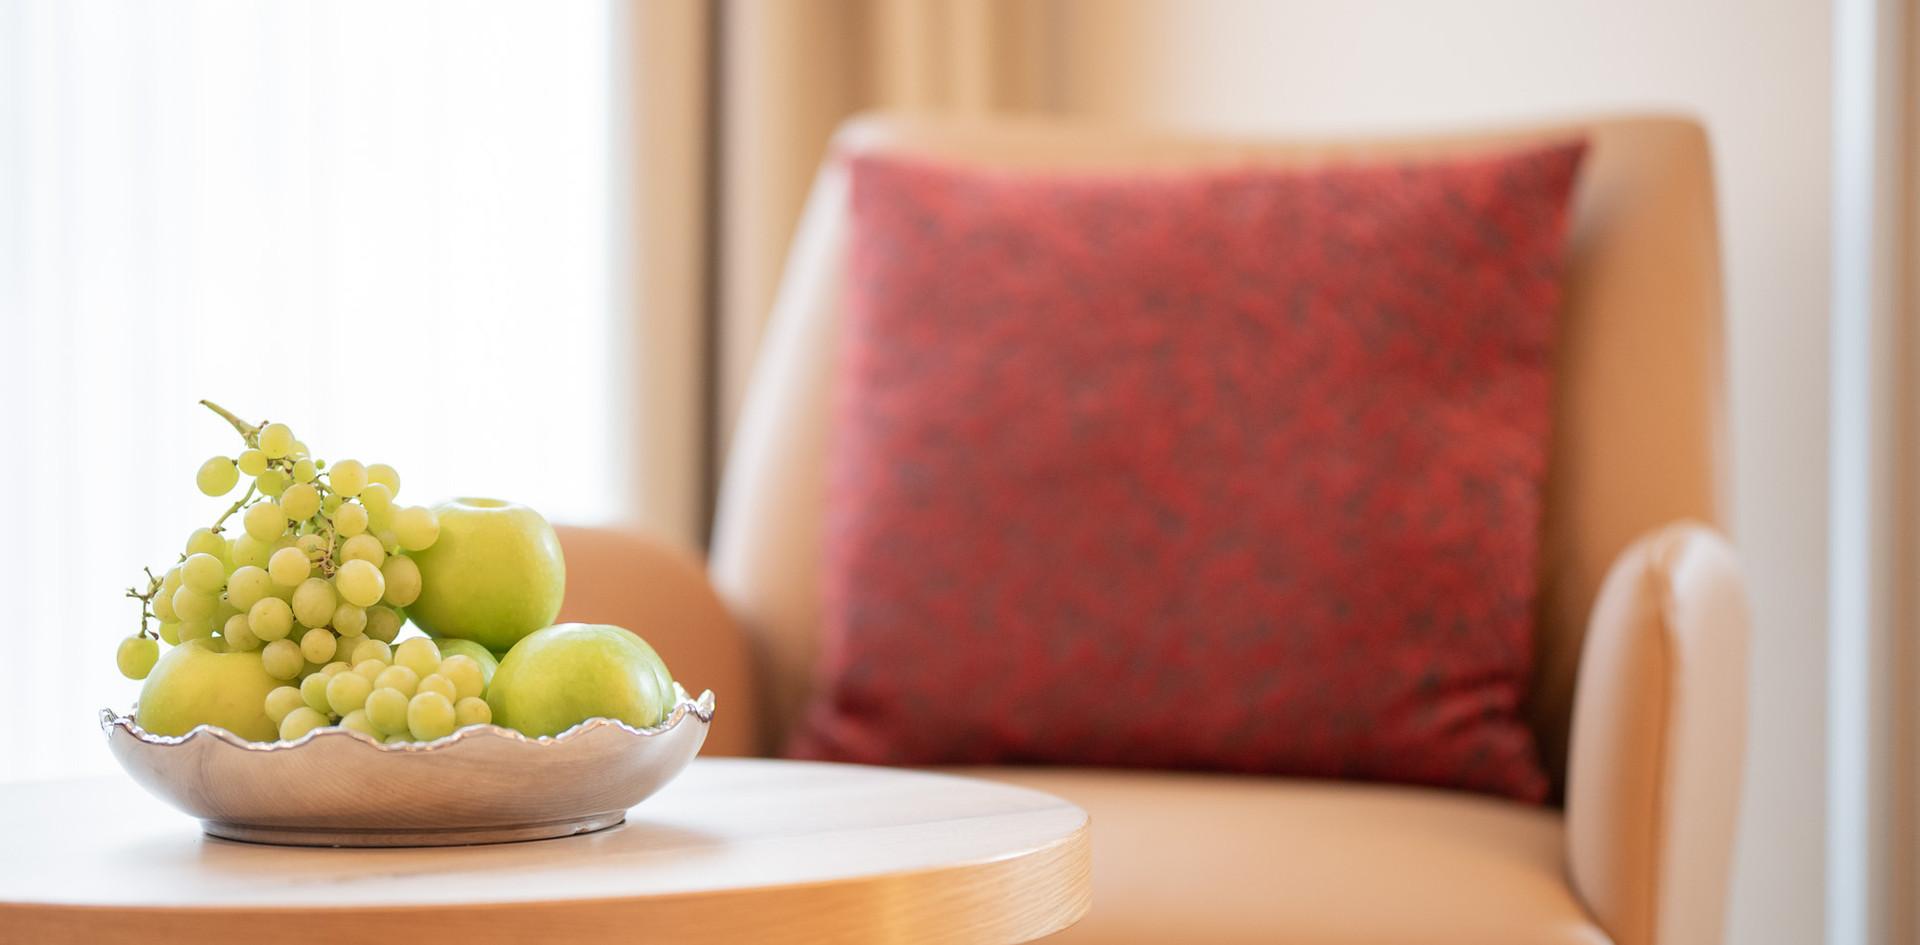 Sitzecke Villa 2 Hotel Wegner - The culinary Art Hotel - The culinary Art Hotel